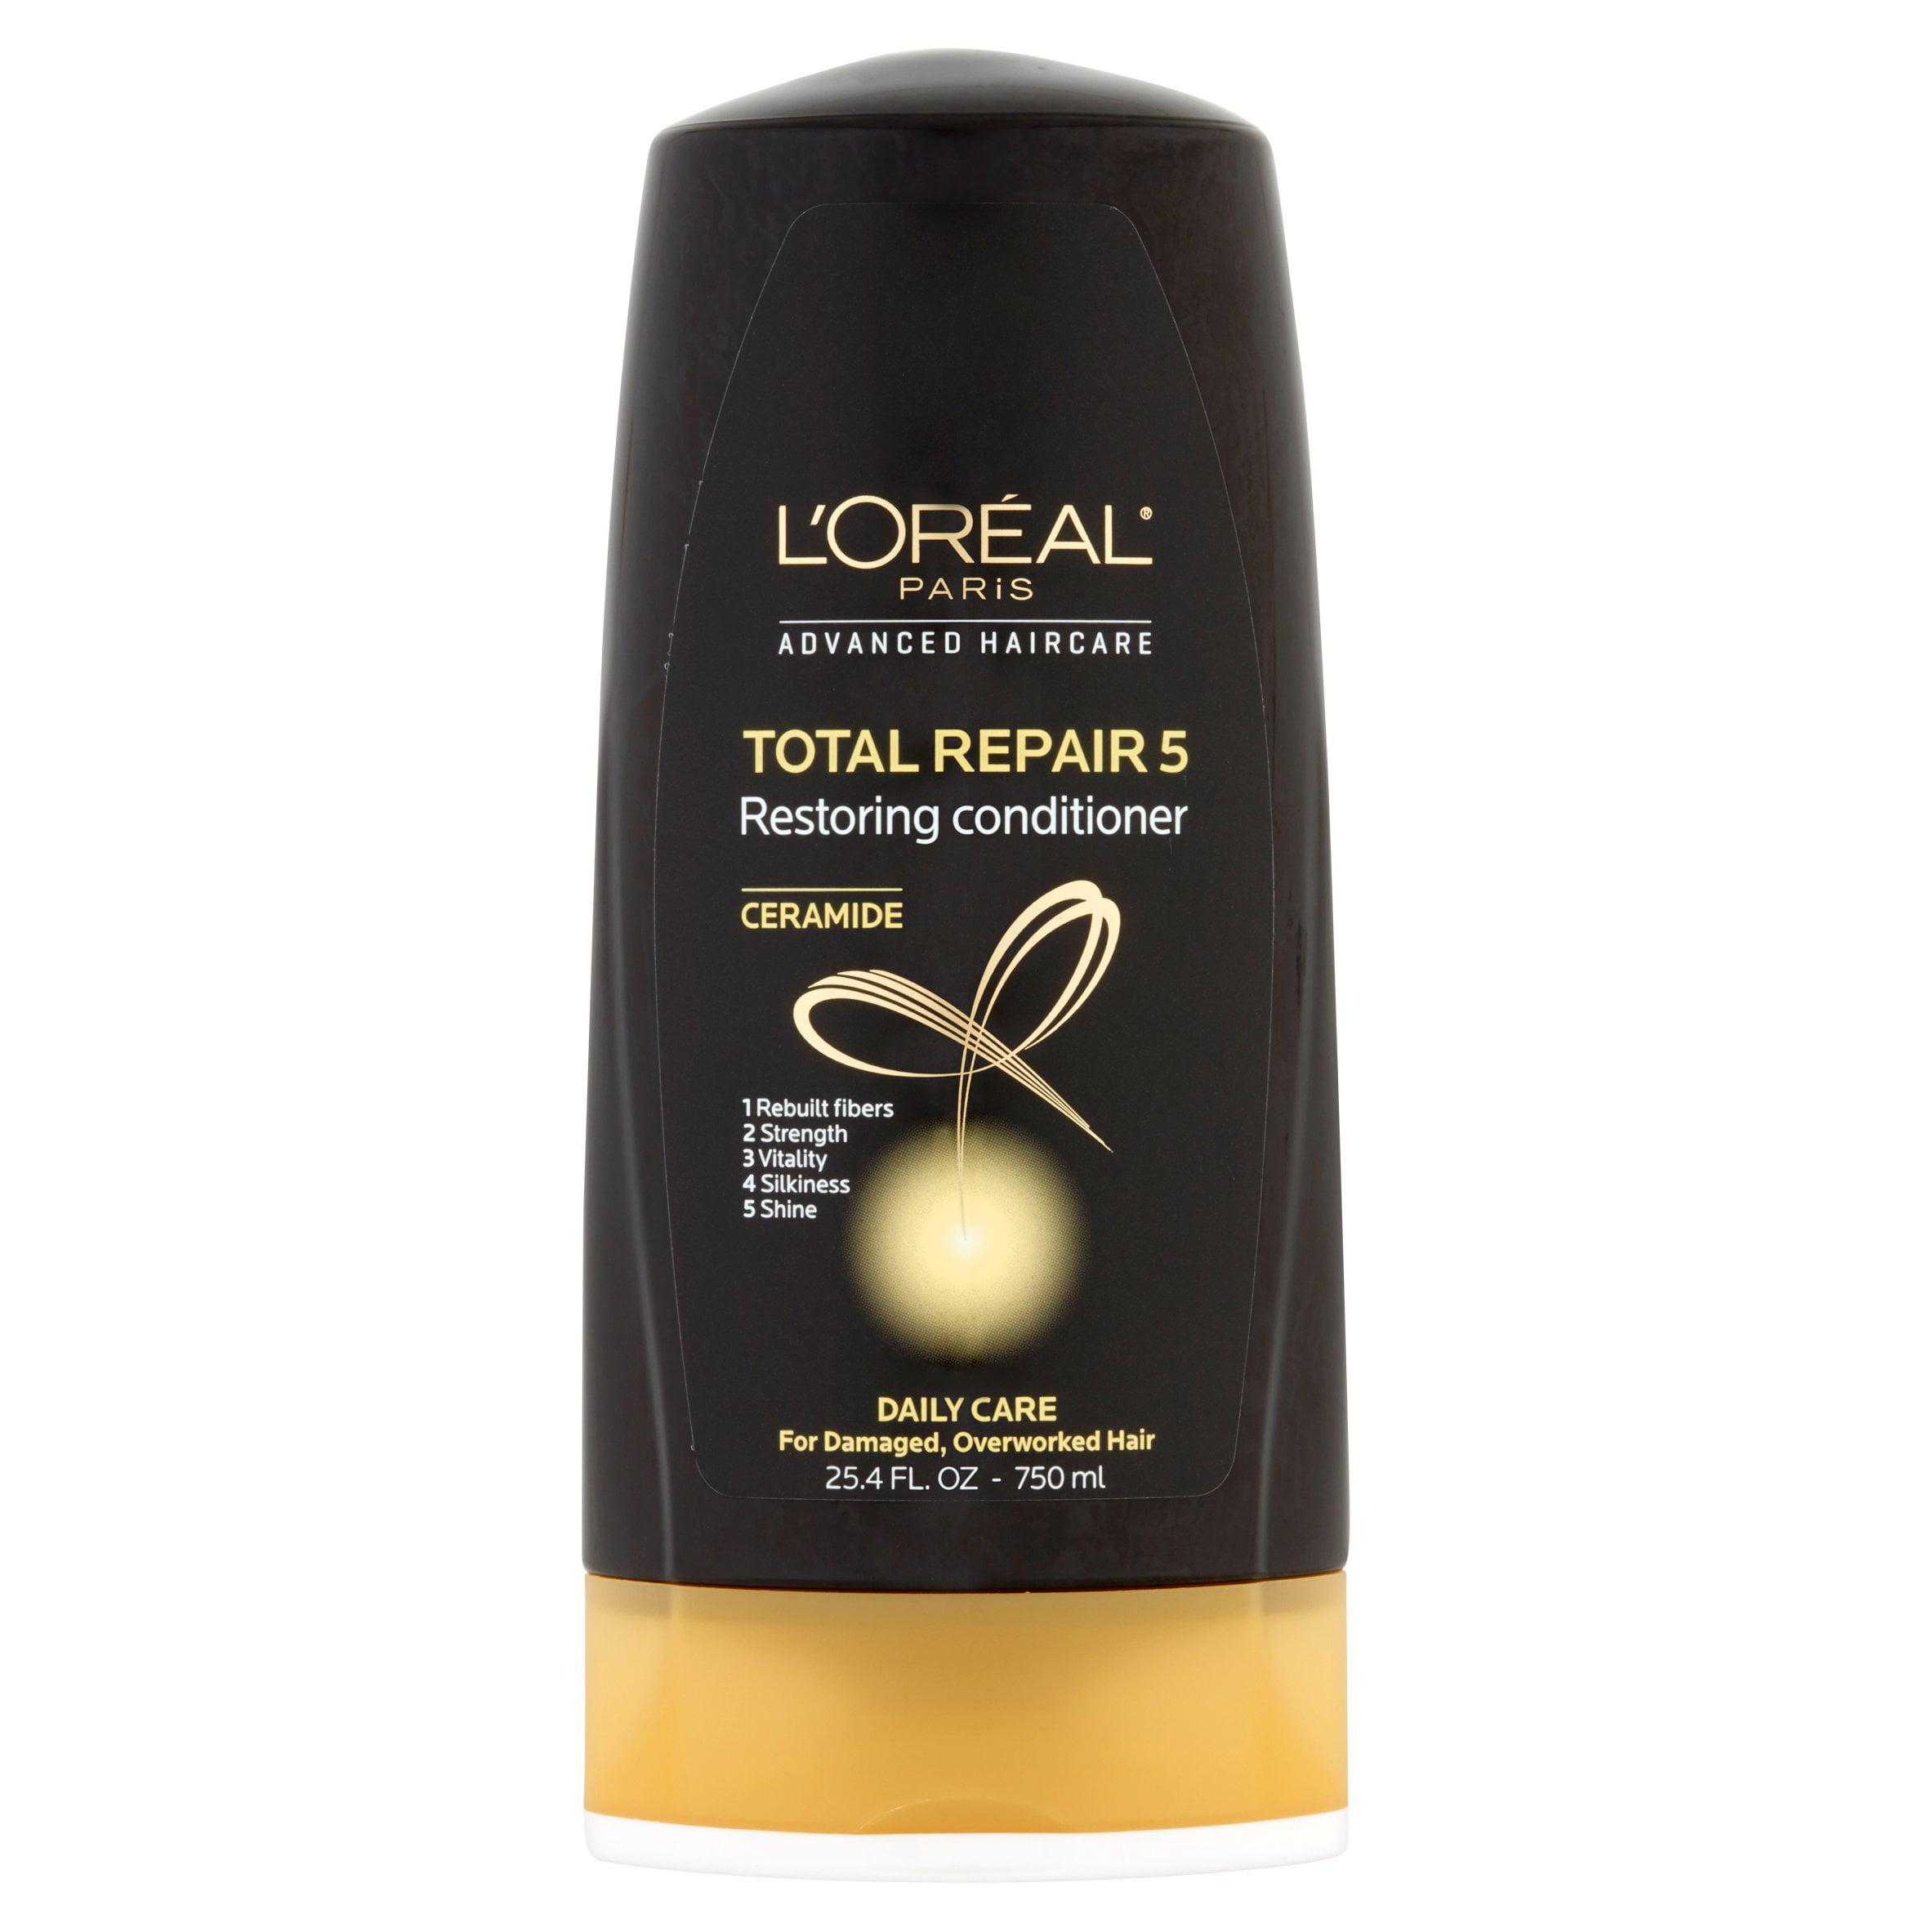 L'Oreal Paris Advanced Haircare Ceramide Total Repair 5 Restoring Conditioner, 25.4 fl oz